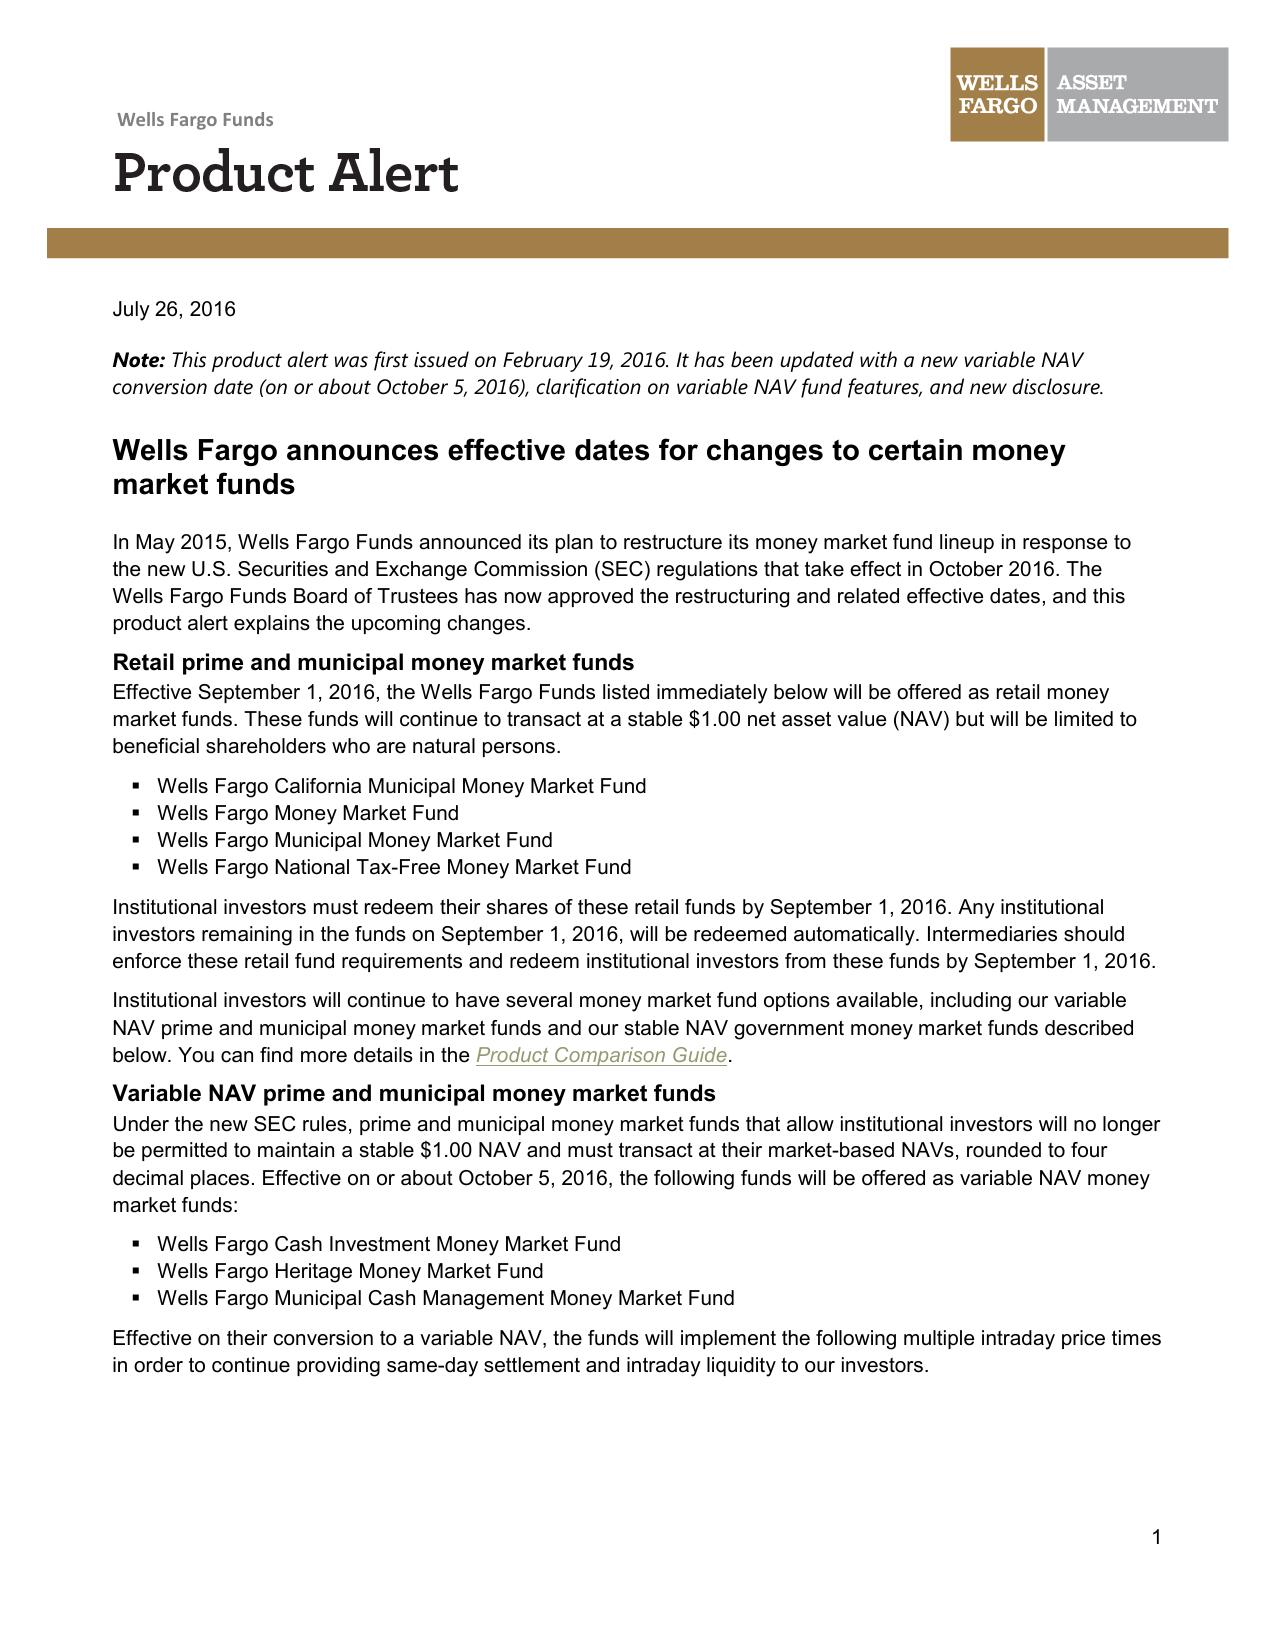 Wells Fargo announces effective dates for changes to certain money